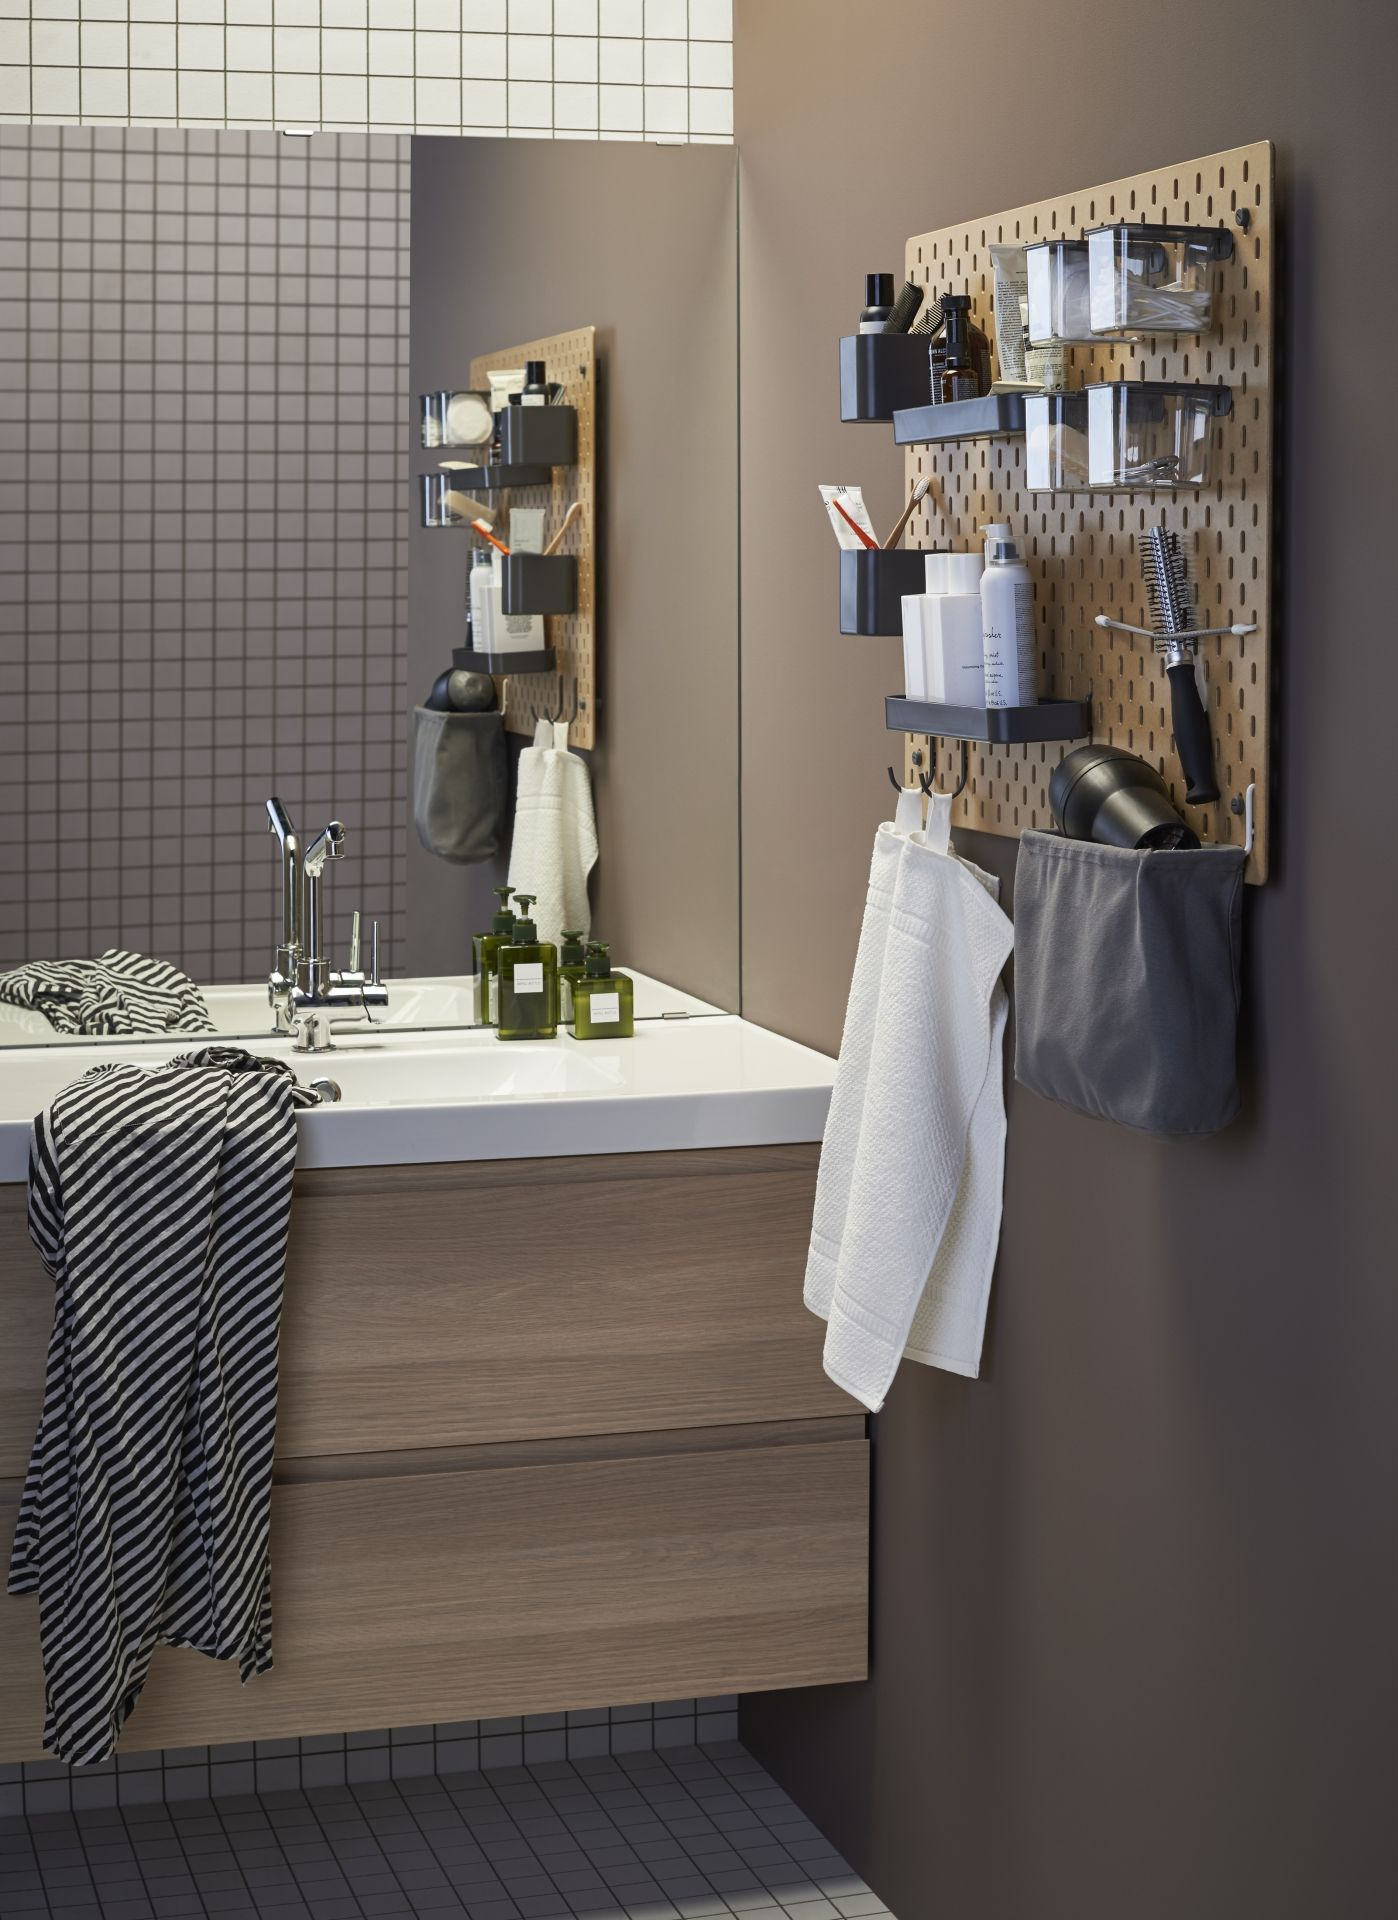 Toiletries Organization Bedroom